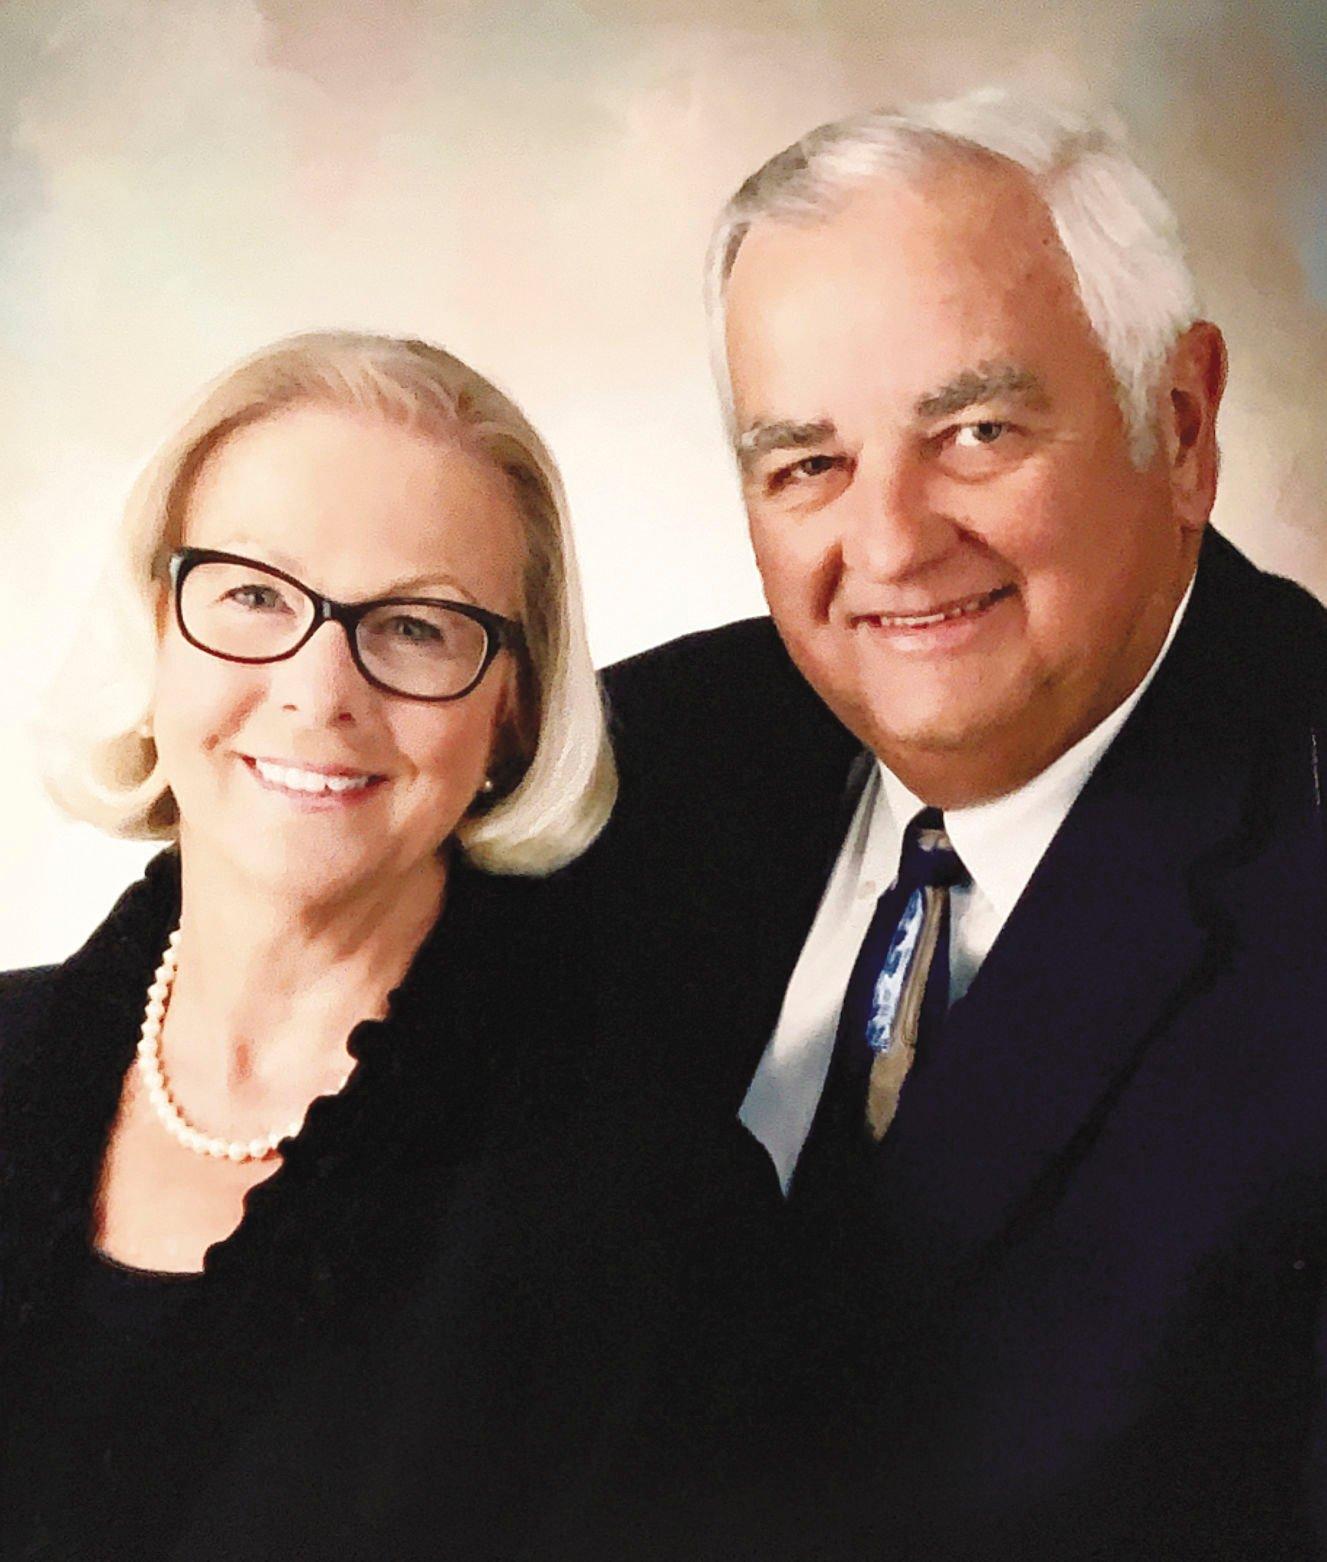 Married 55 years: Larry and Tamara Fischer OLDER